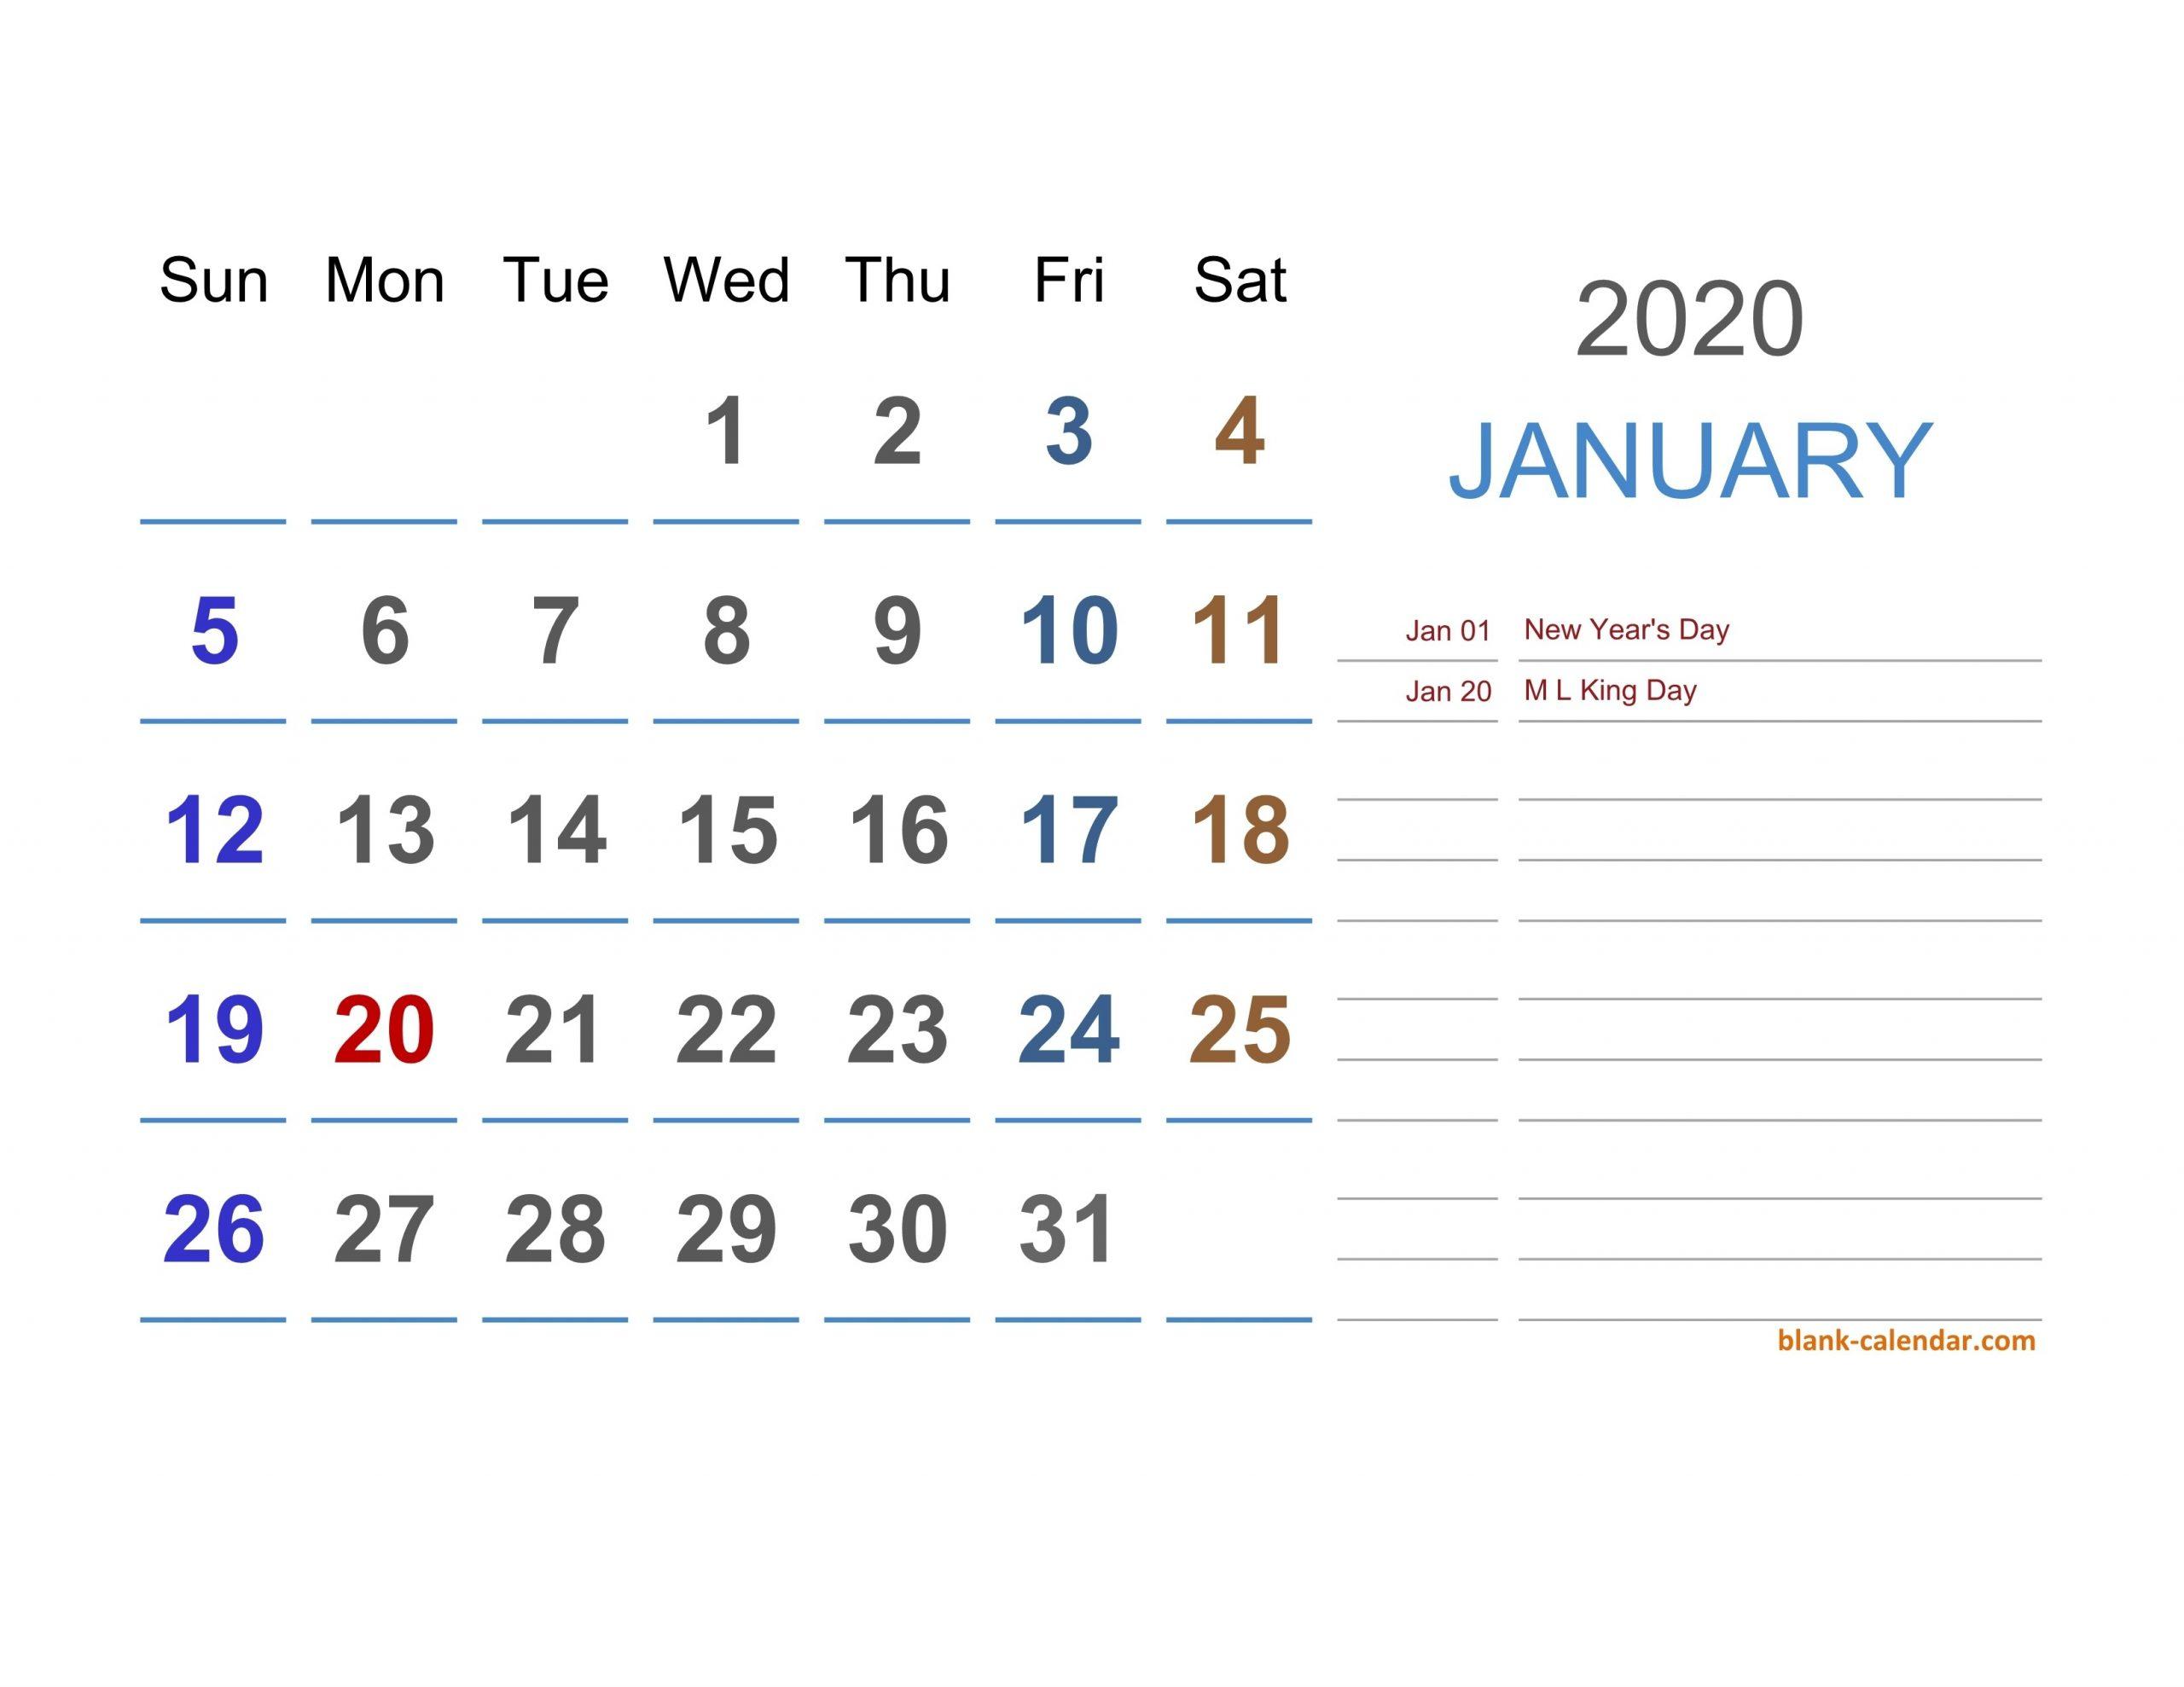 2020 Excel Calendar   Free Download Excel Calendar Templates-Download 2021 Philippine Blank Calendar In Excel